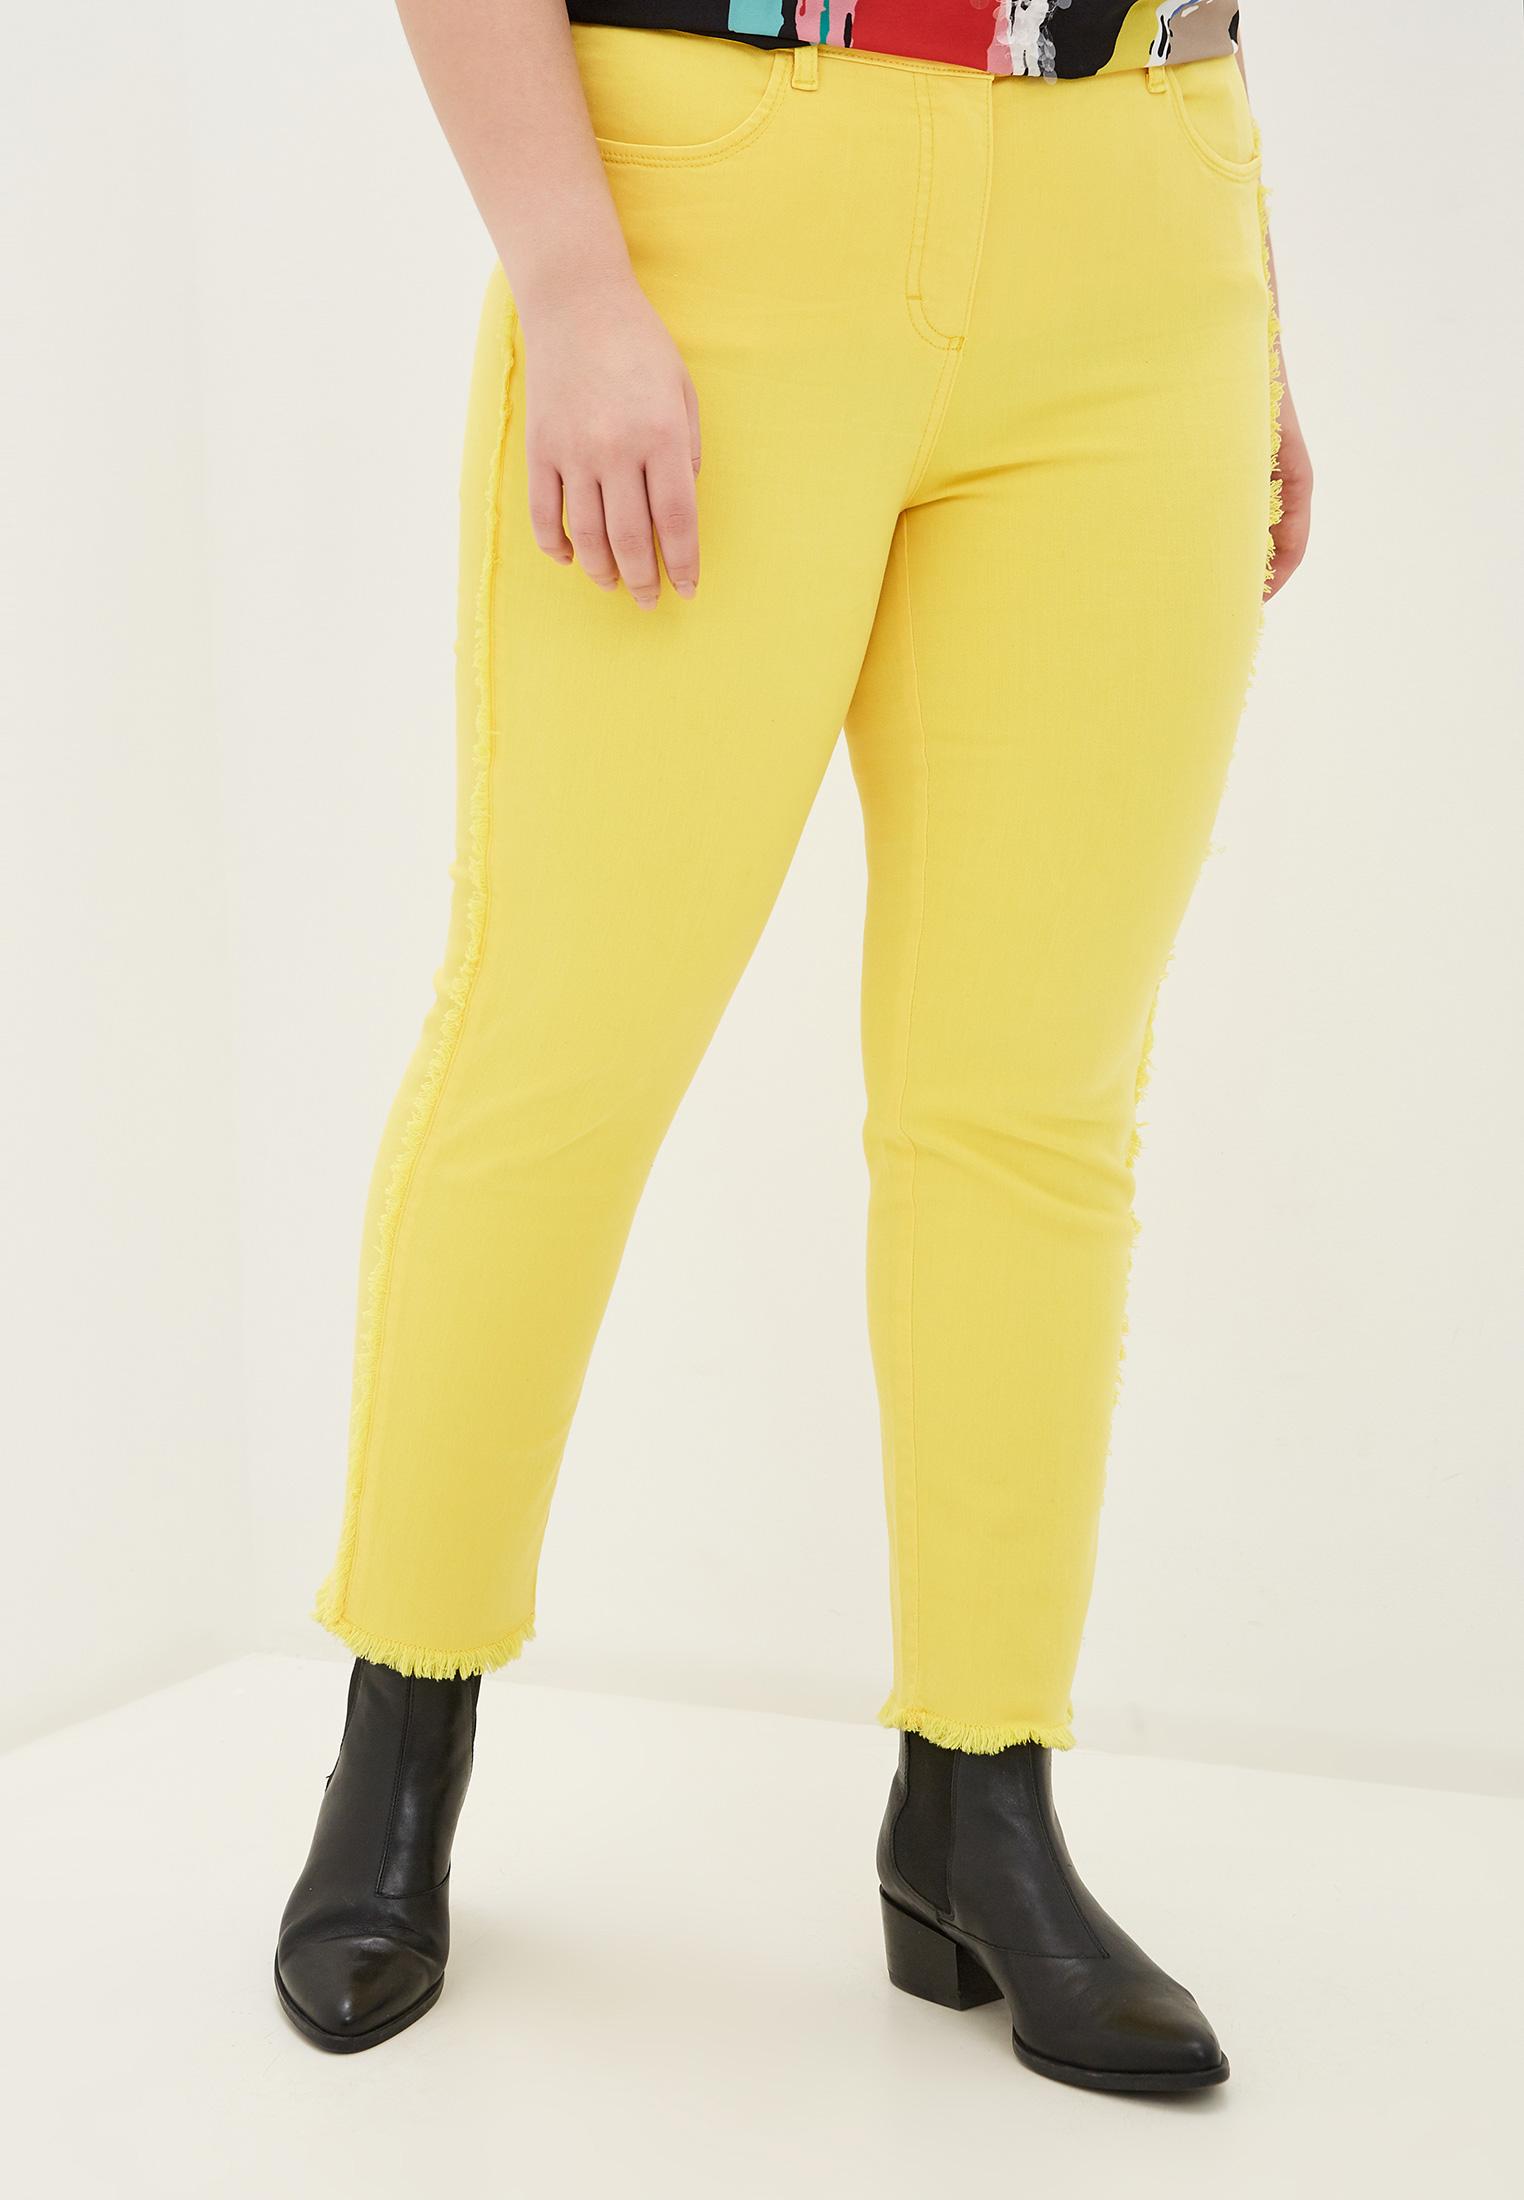 Женские зауженные брюки Samoon by Gerry Weber 220058-21212